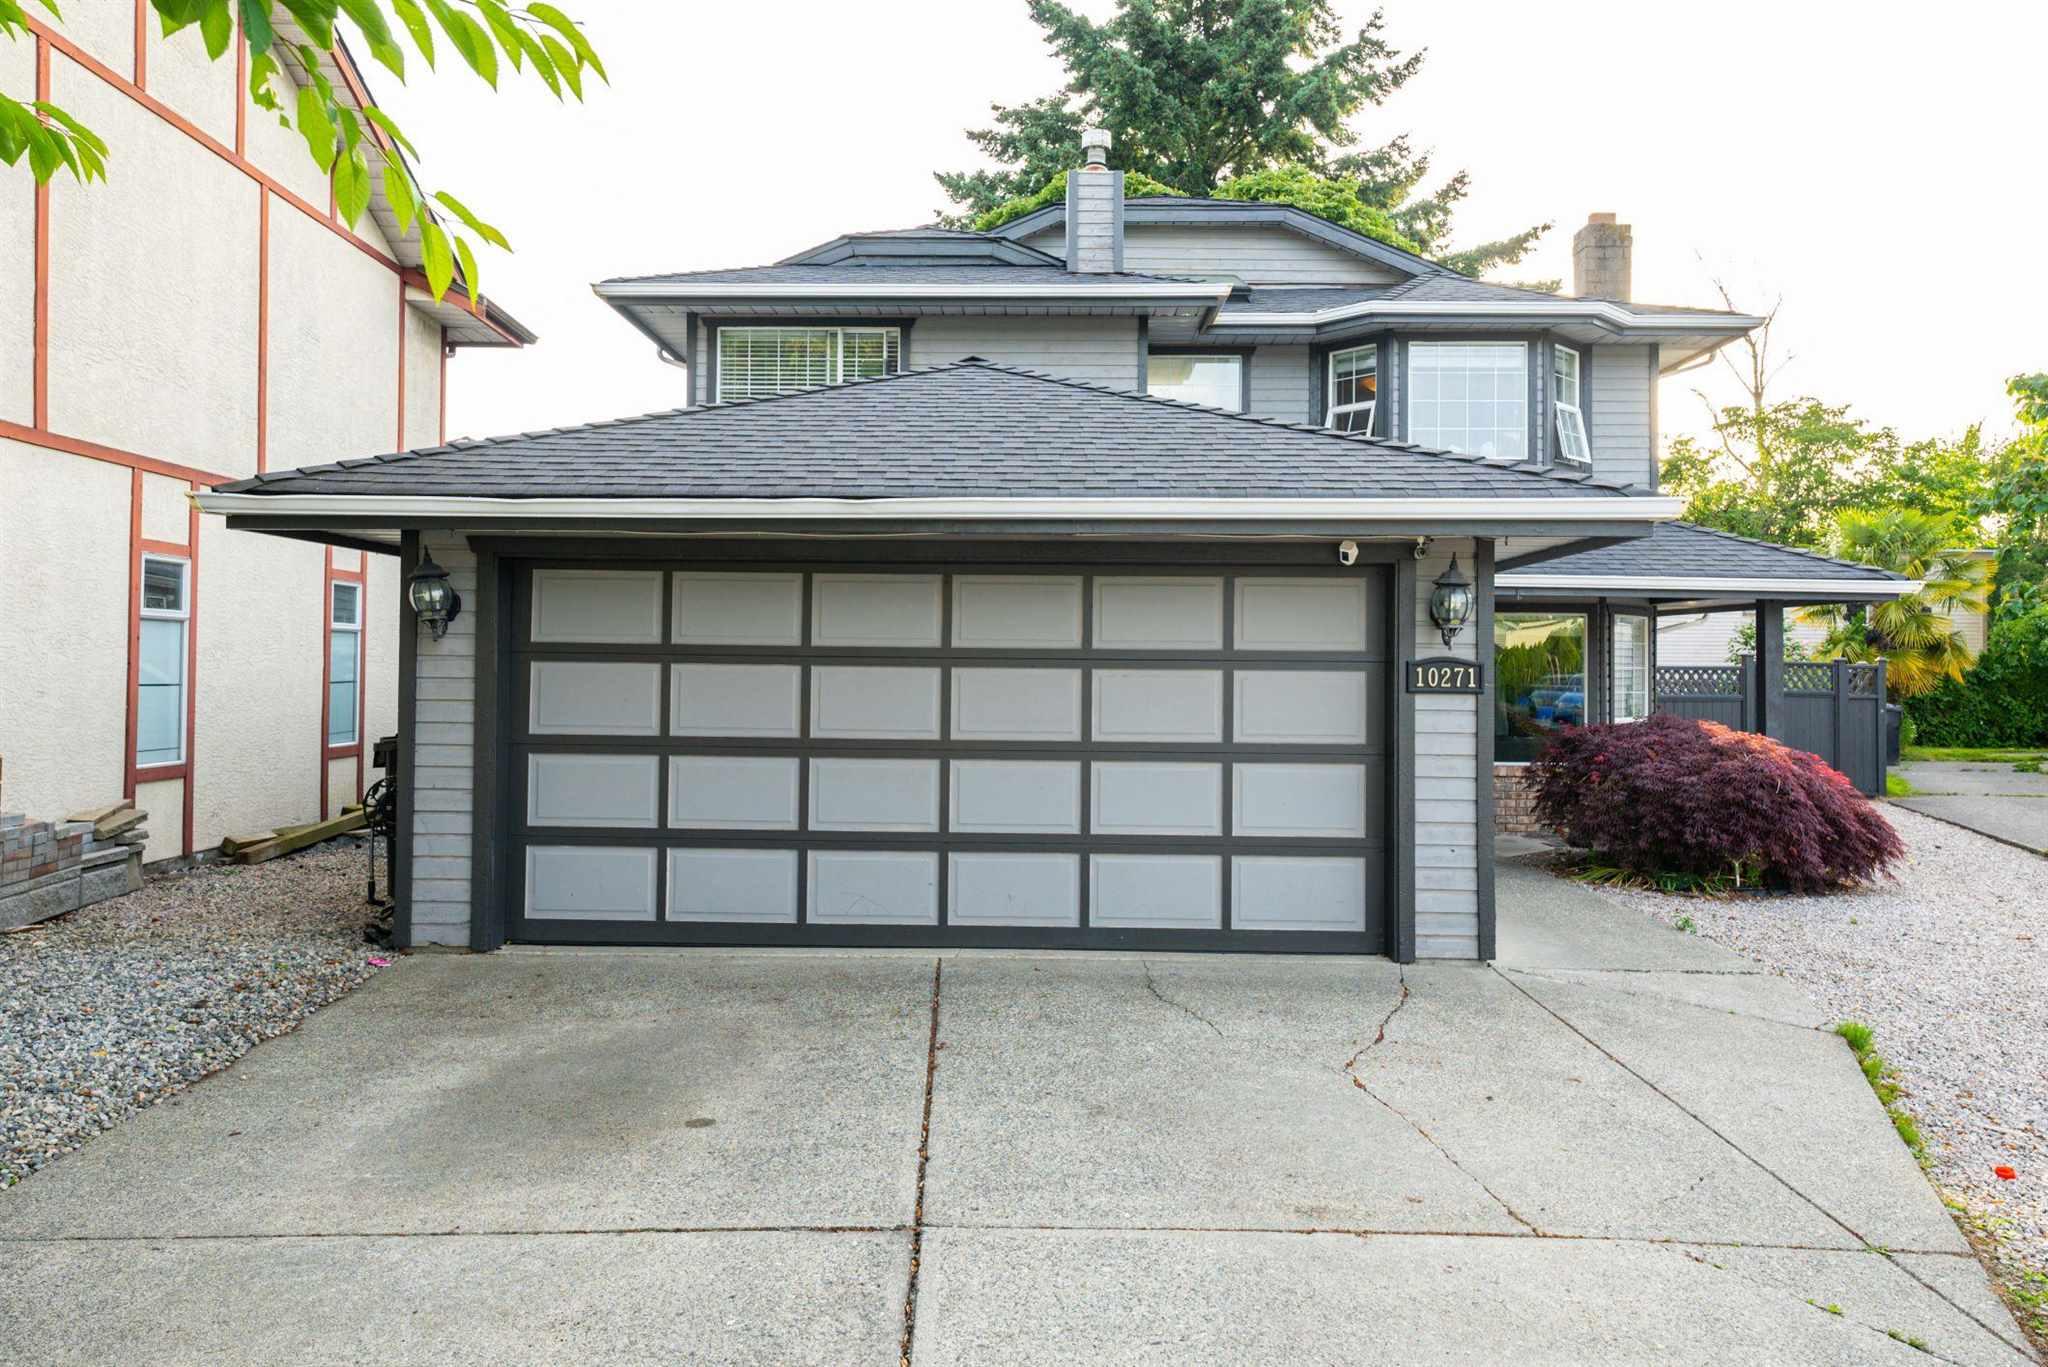 10271 MCLEOD COURT - Bridgeport RI House/Single Family for sale, 5 Bedrooms (R2595495)